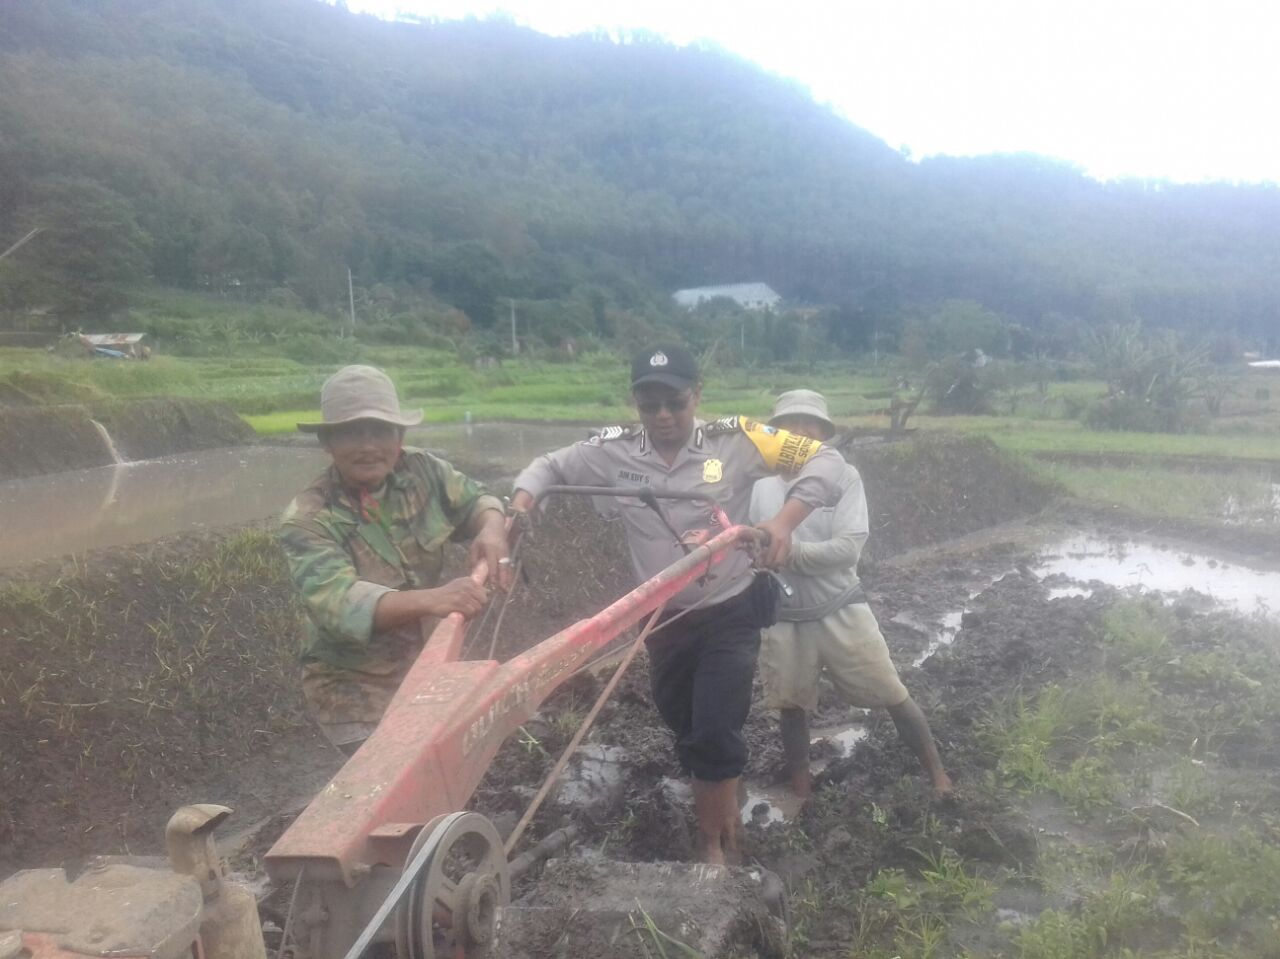 Sambang Petani Padi Anggota Bhabinkamtibmas Polsek Batu Polres Batu Membantu Membajak Sawah